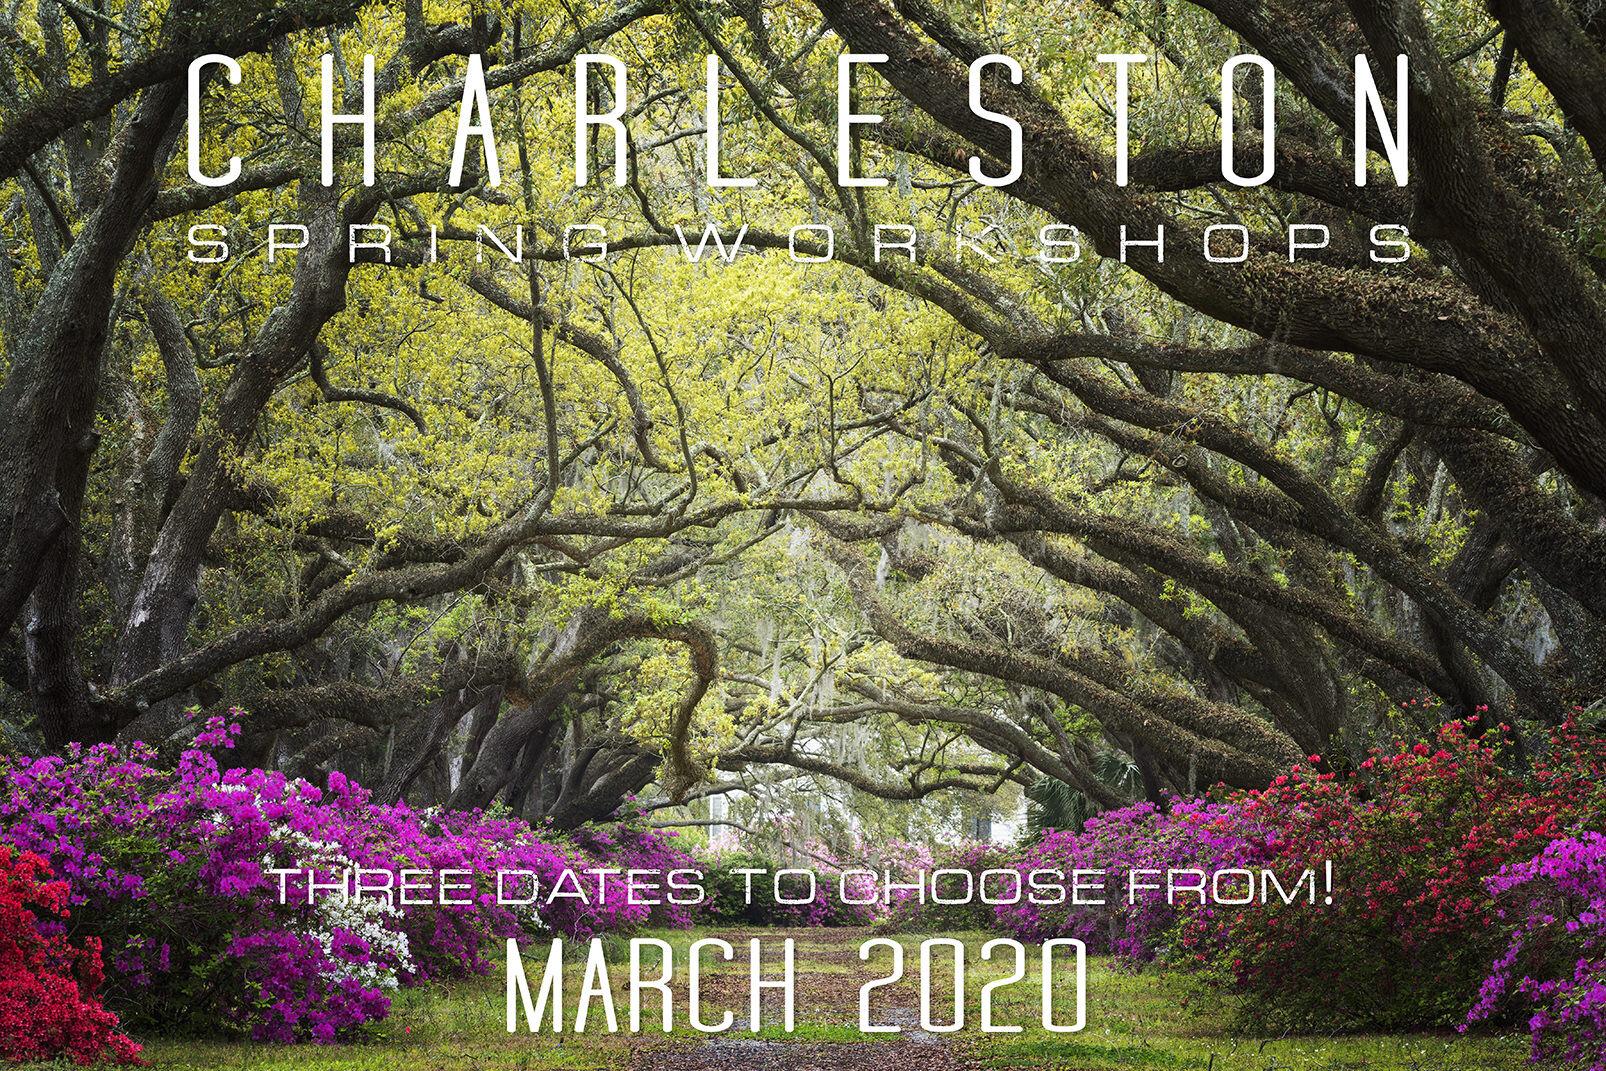 Charleston Spring Photo Workshop